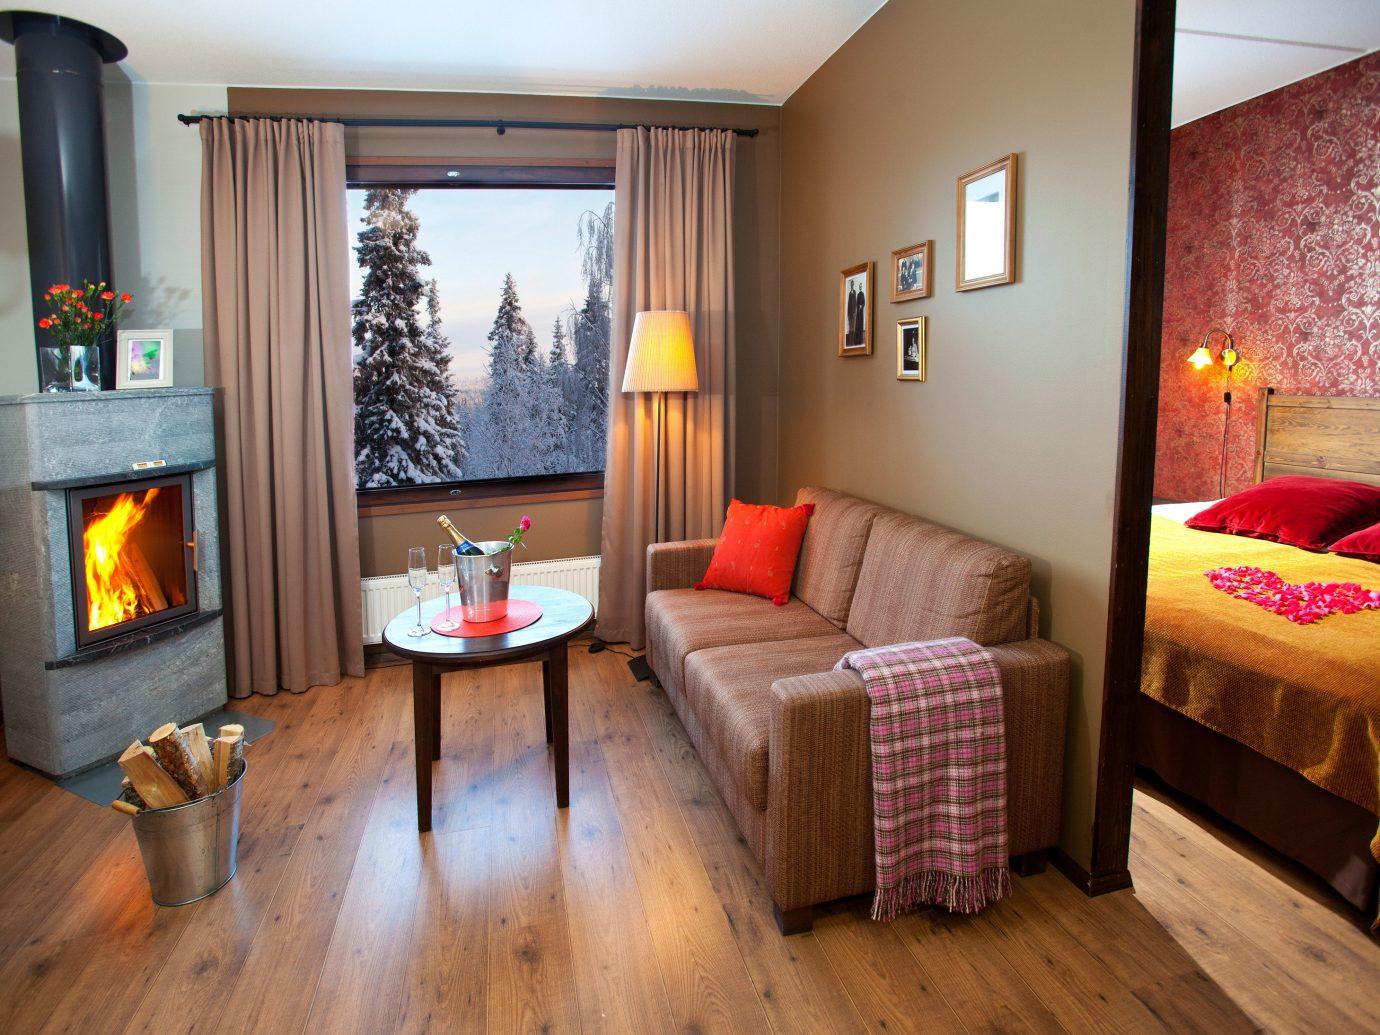 Trip Ideas floor indoor wall Living room property living room estate Suite cottage hardwood home real estate interior design furniture Bedroom wood flooring wood area decorated